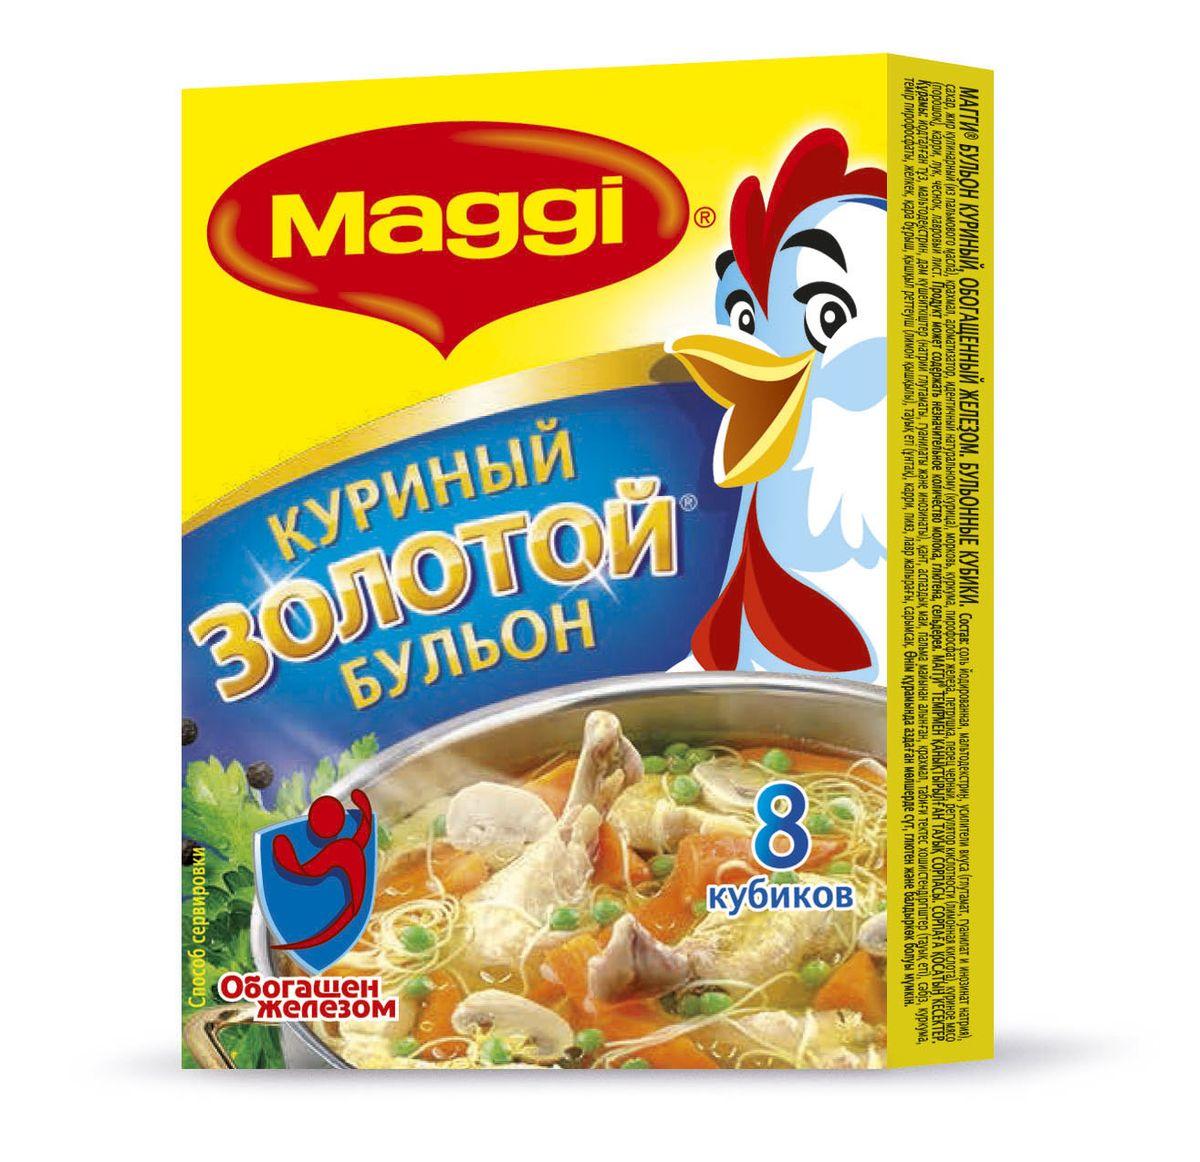 Maggi Золотой бульон с курицей, 8 кубиков по 10 г ( 12292329 )